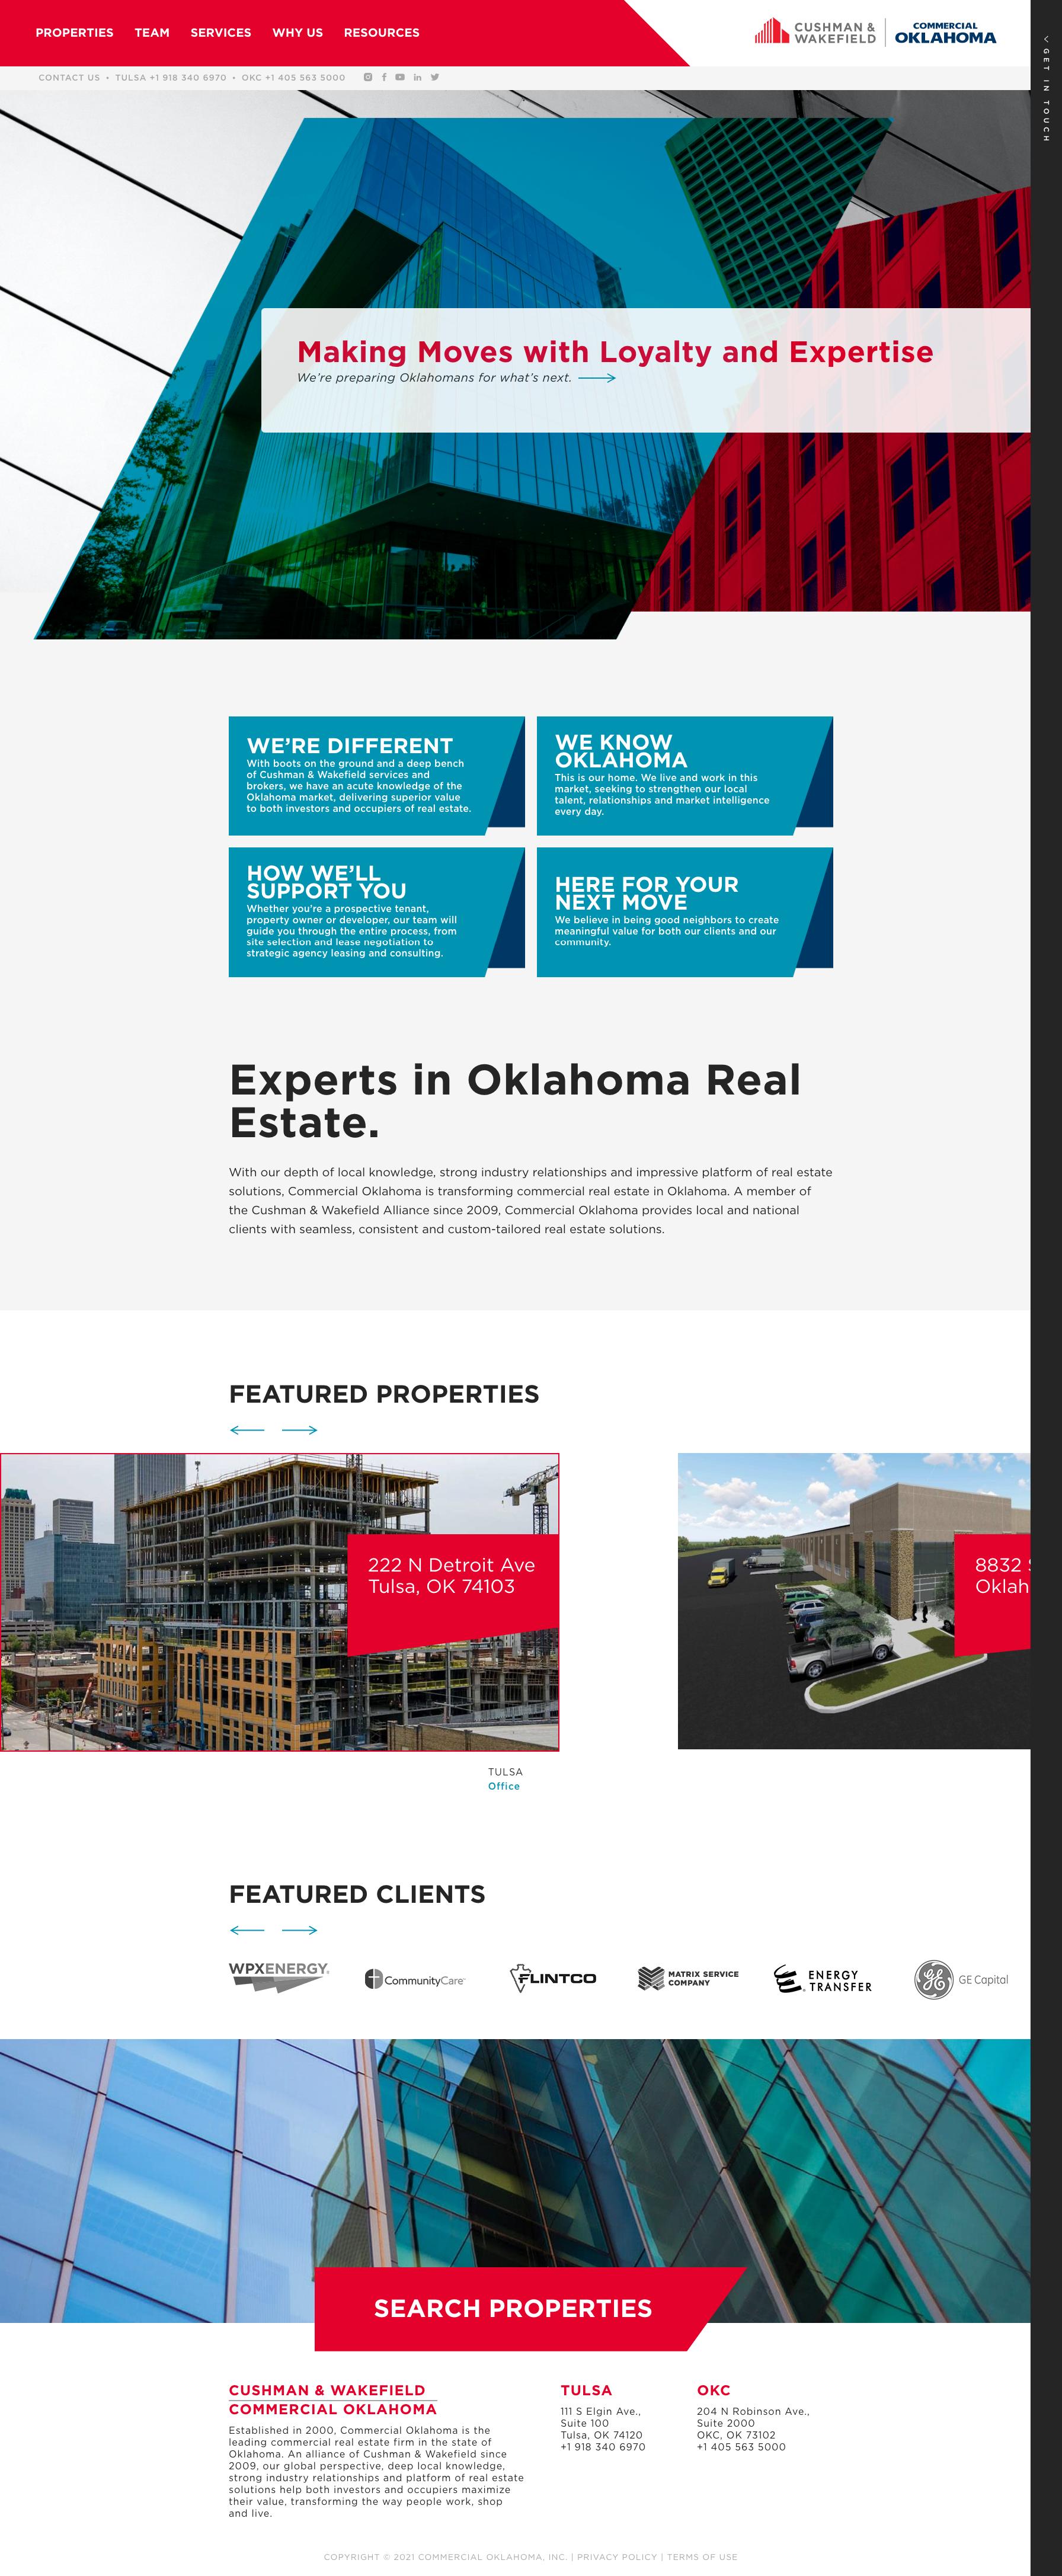 Cushman Wakefield / Commercial Oklahoma